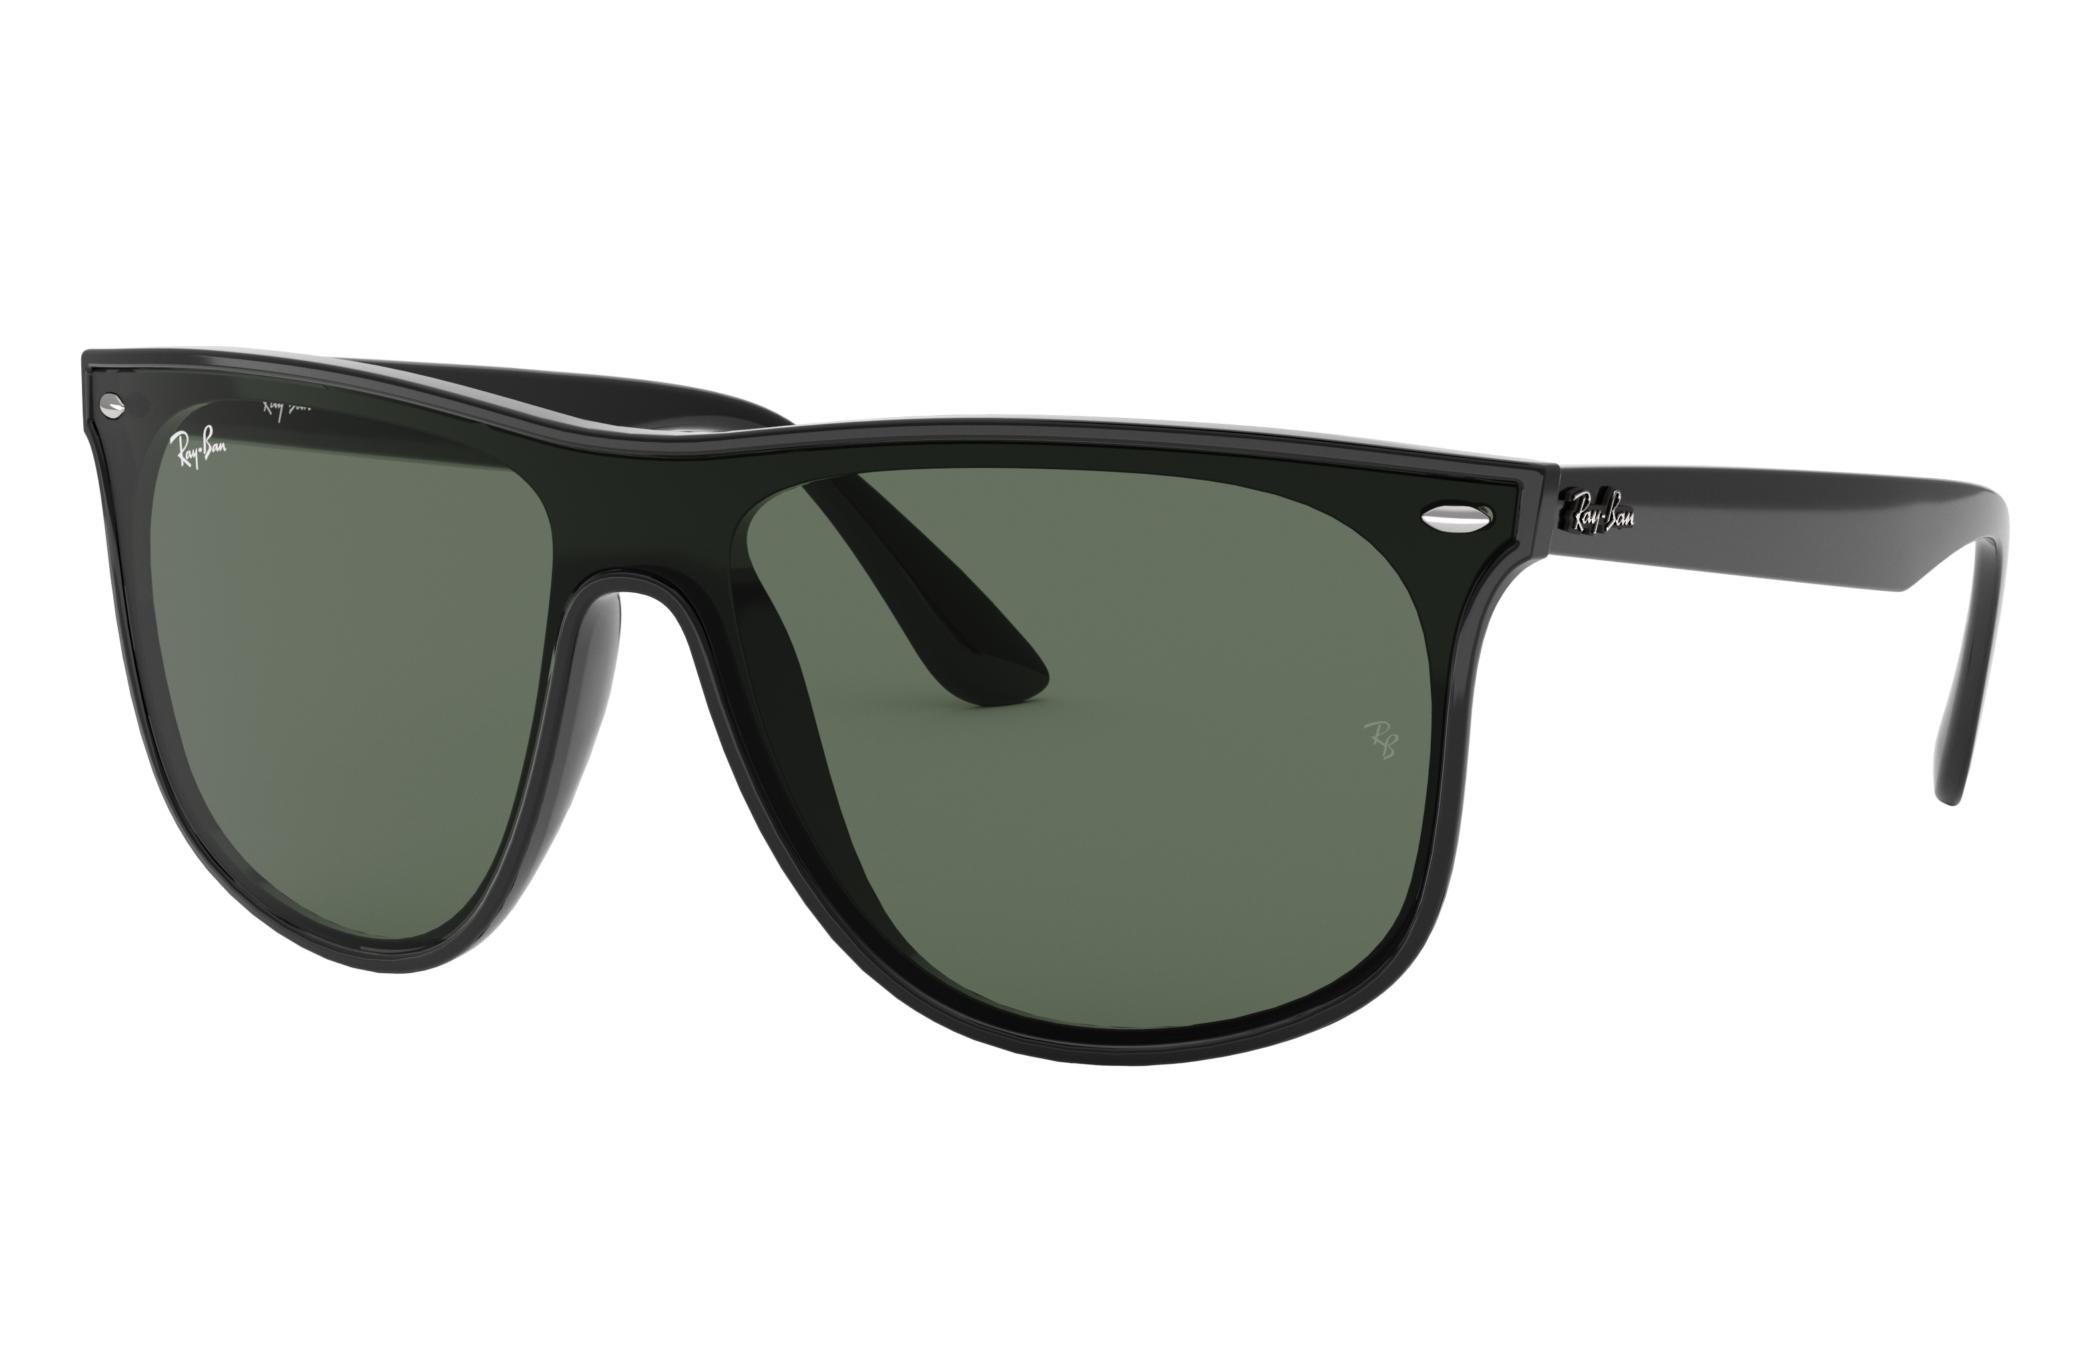 Ray-Ban Blaze Rb4447n Black, Green Lenses - RB4447N